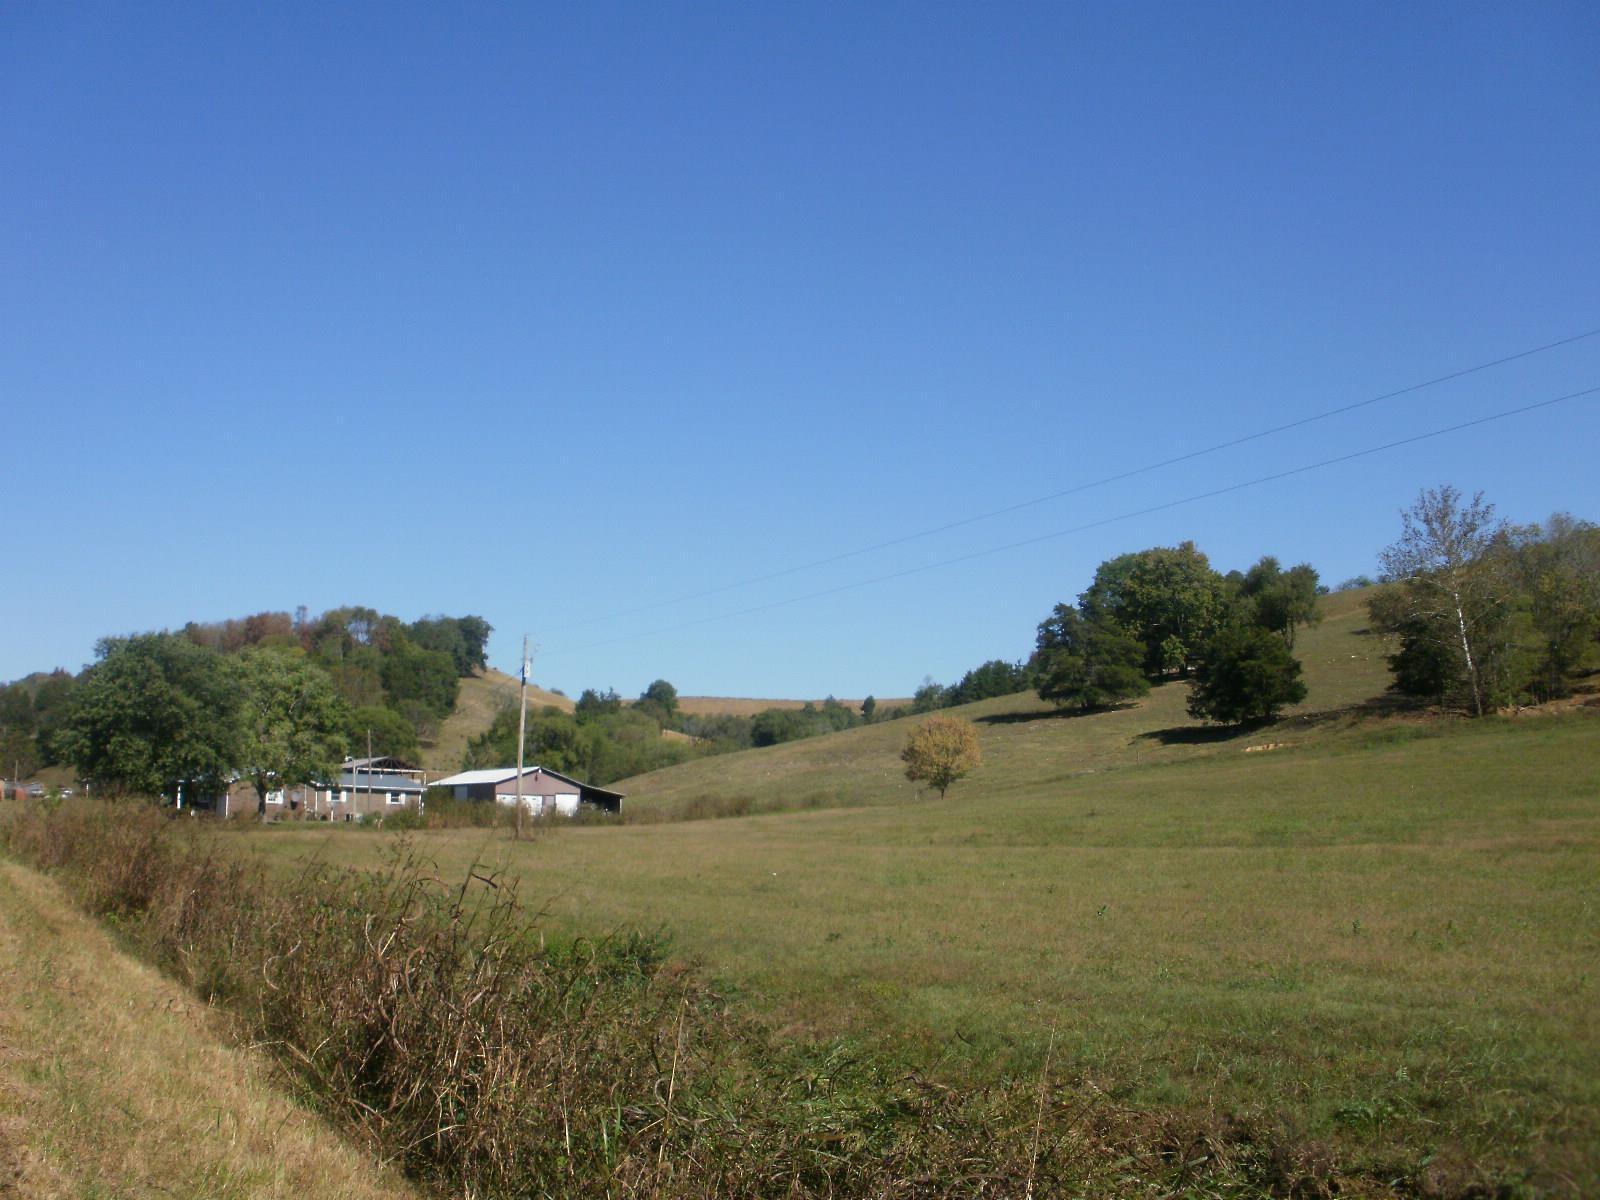 1446 Bagley Hollow Rd, Fayetteville, TN 37334 - Fayetteville, TN real estate listing